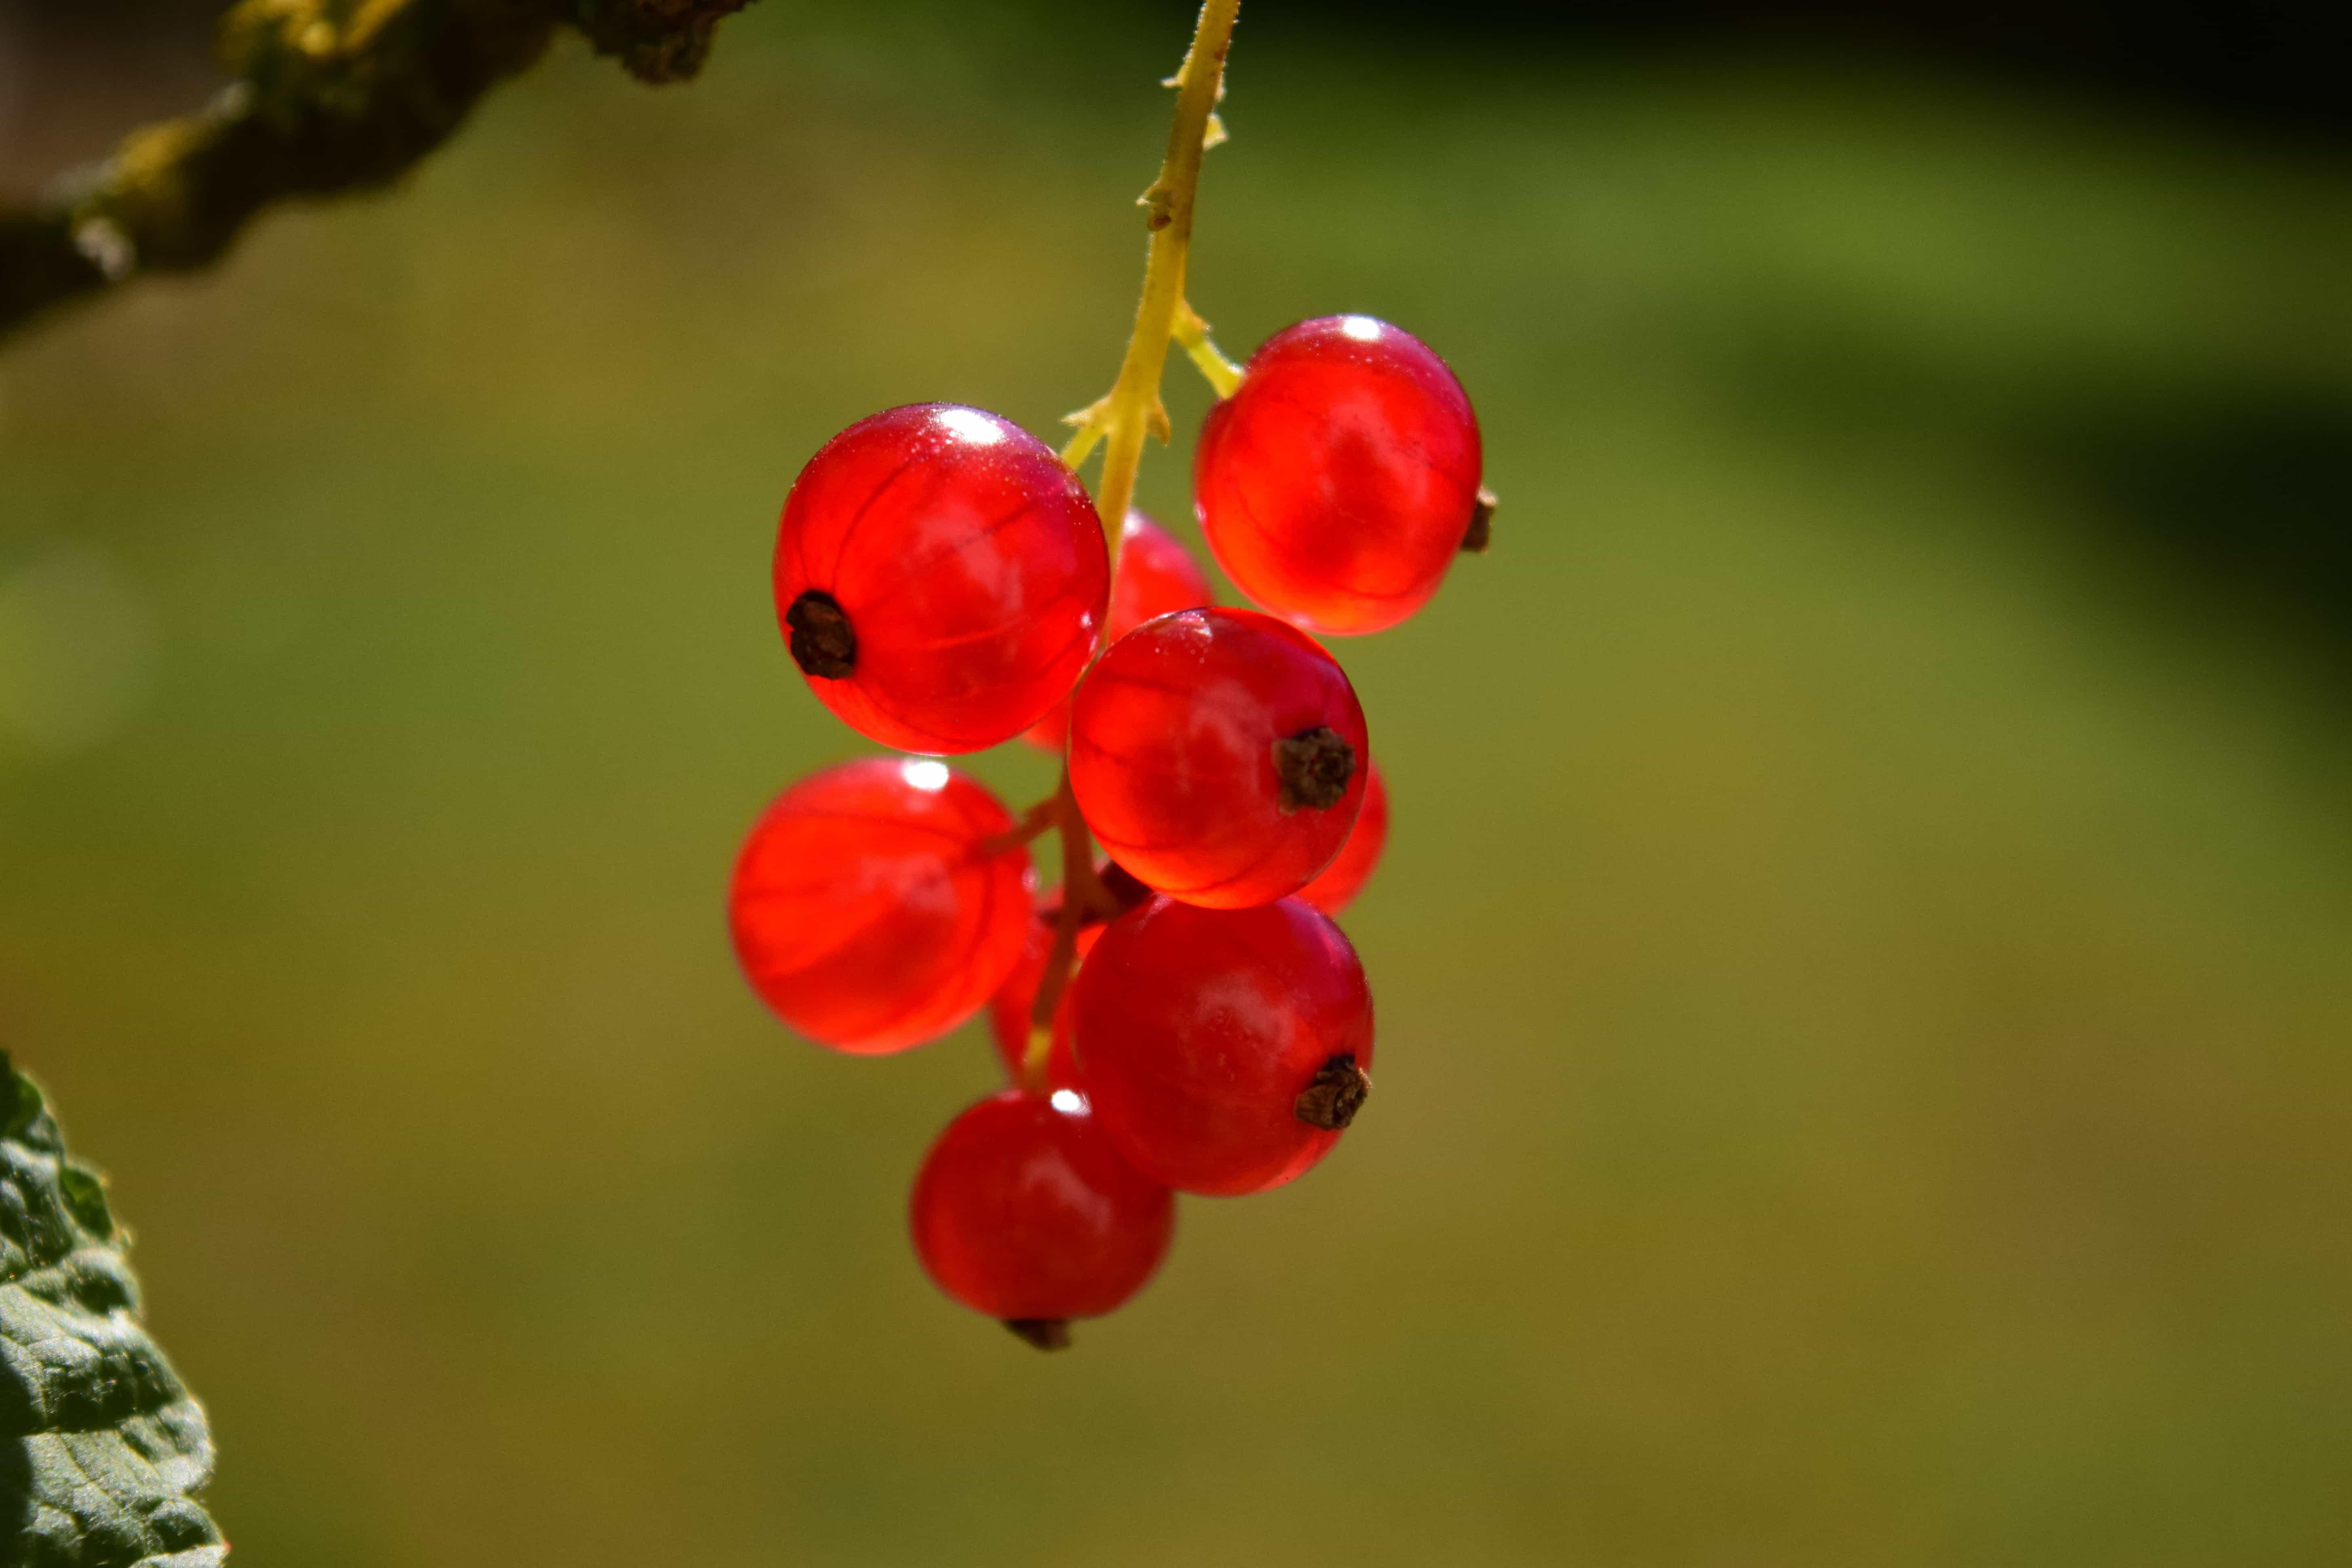 3d 2018 Wallpaper Image Libre Fruits Nature Feuilles Berry 233 T 233